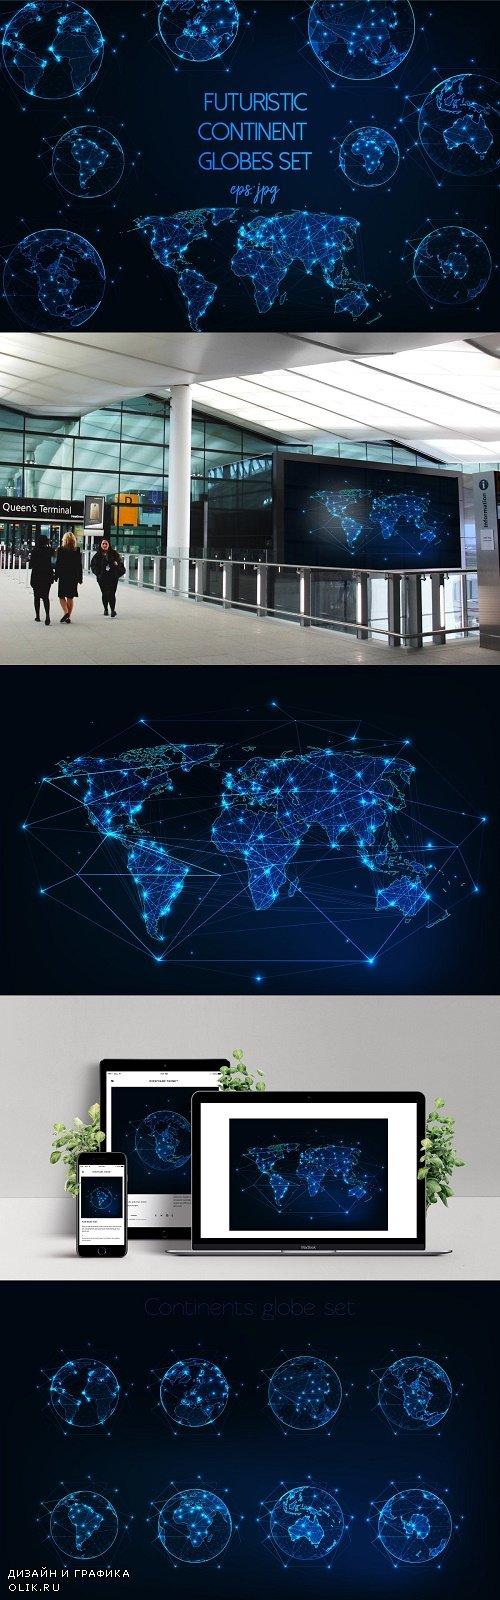 Futuristic continent globes set - 3821017